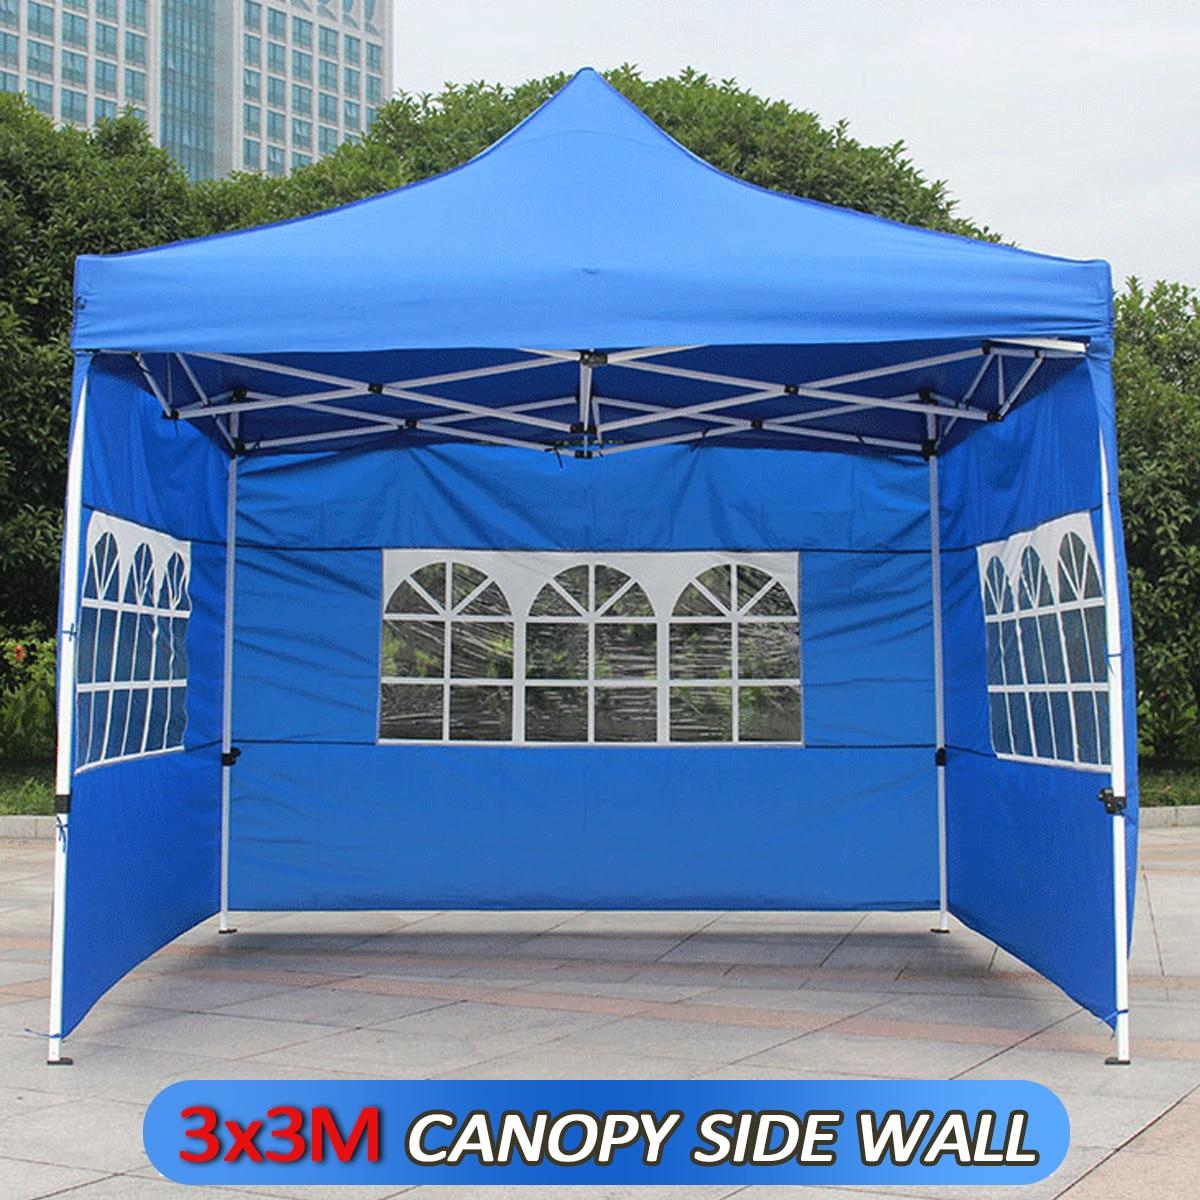 Oxford Cloth Party Tent Wall Sides Waterproof Garden Patio Outdoor Canopy 3x3m Sun Wall Sunshade Shelter Tarp Sidewall Sunshade